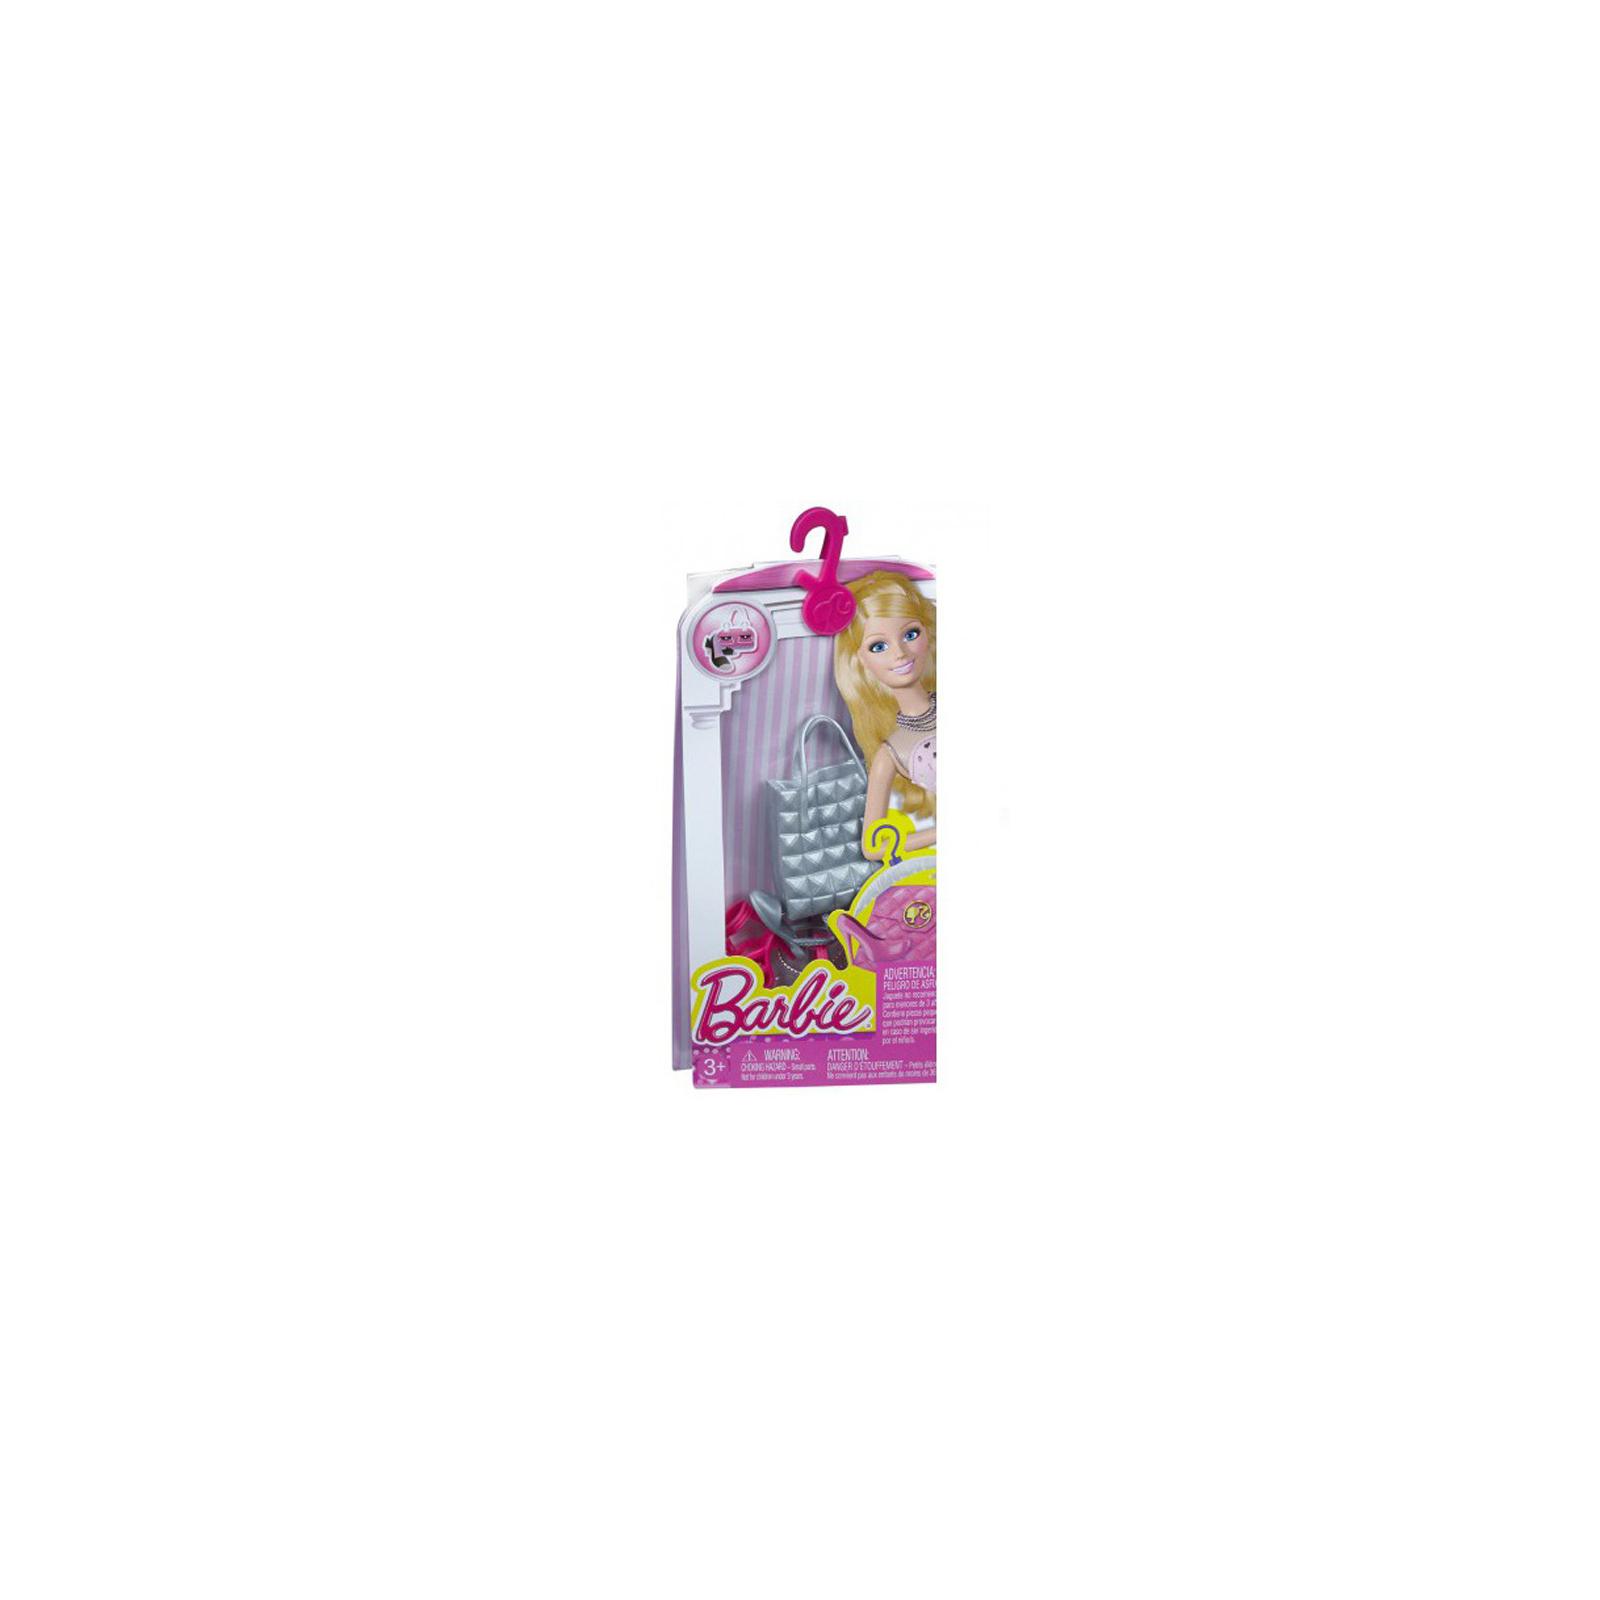 Аксессуар к кукле BARBIE Серебристая сумка Гламур (CFX30-3) изображение 2